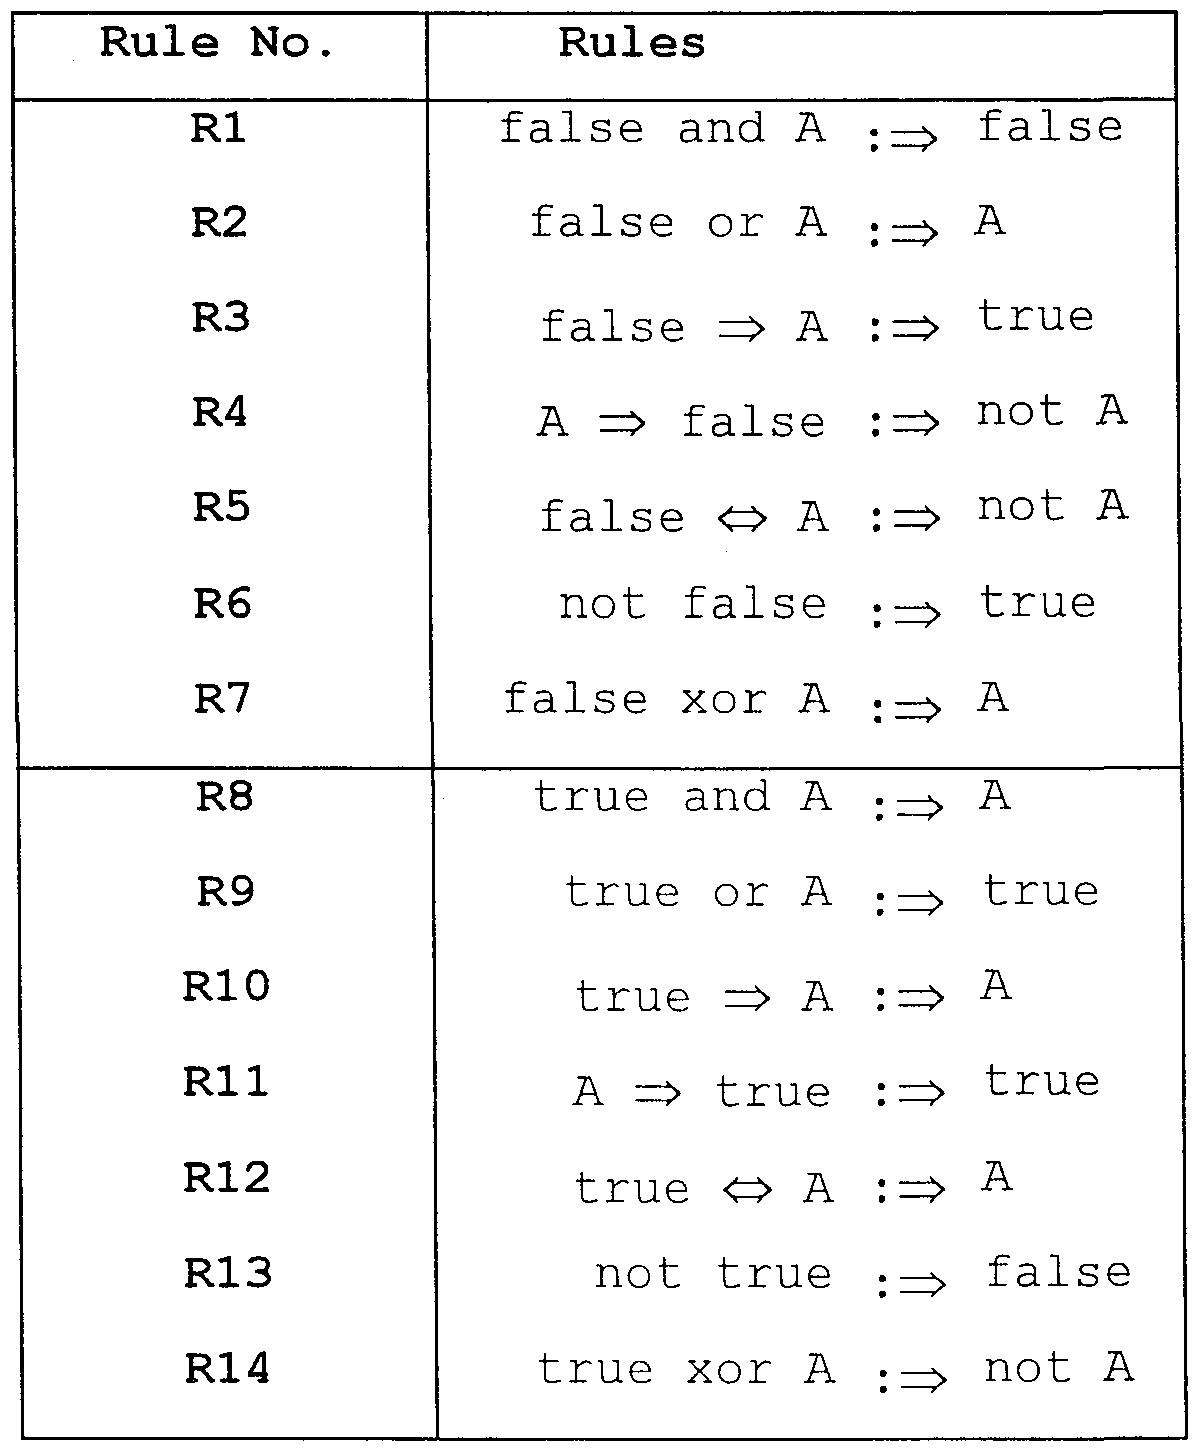 Logic symbols chart gallery symbol and sign ideas algebra symbols chart images algebra symbols chart algebra symbols chart figure algebra symbols chart figure source buycottarizona